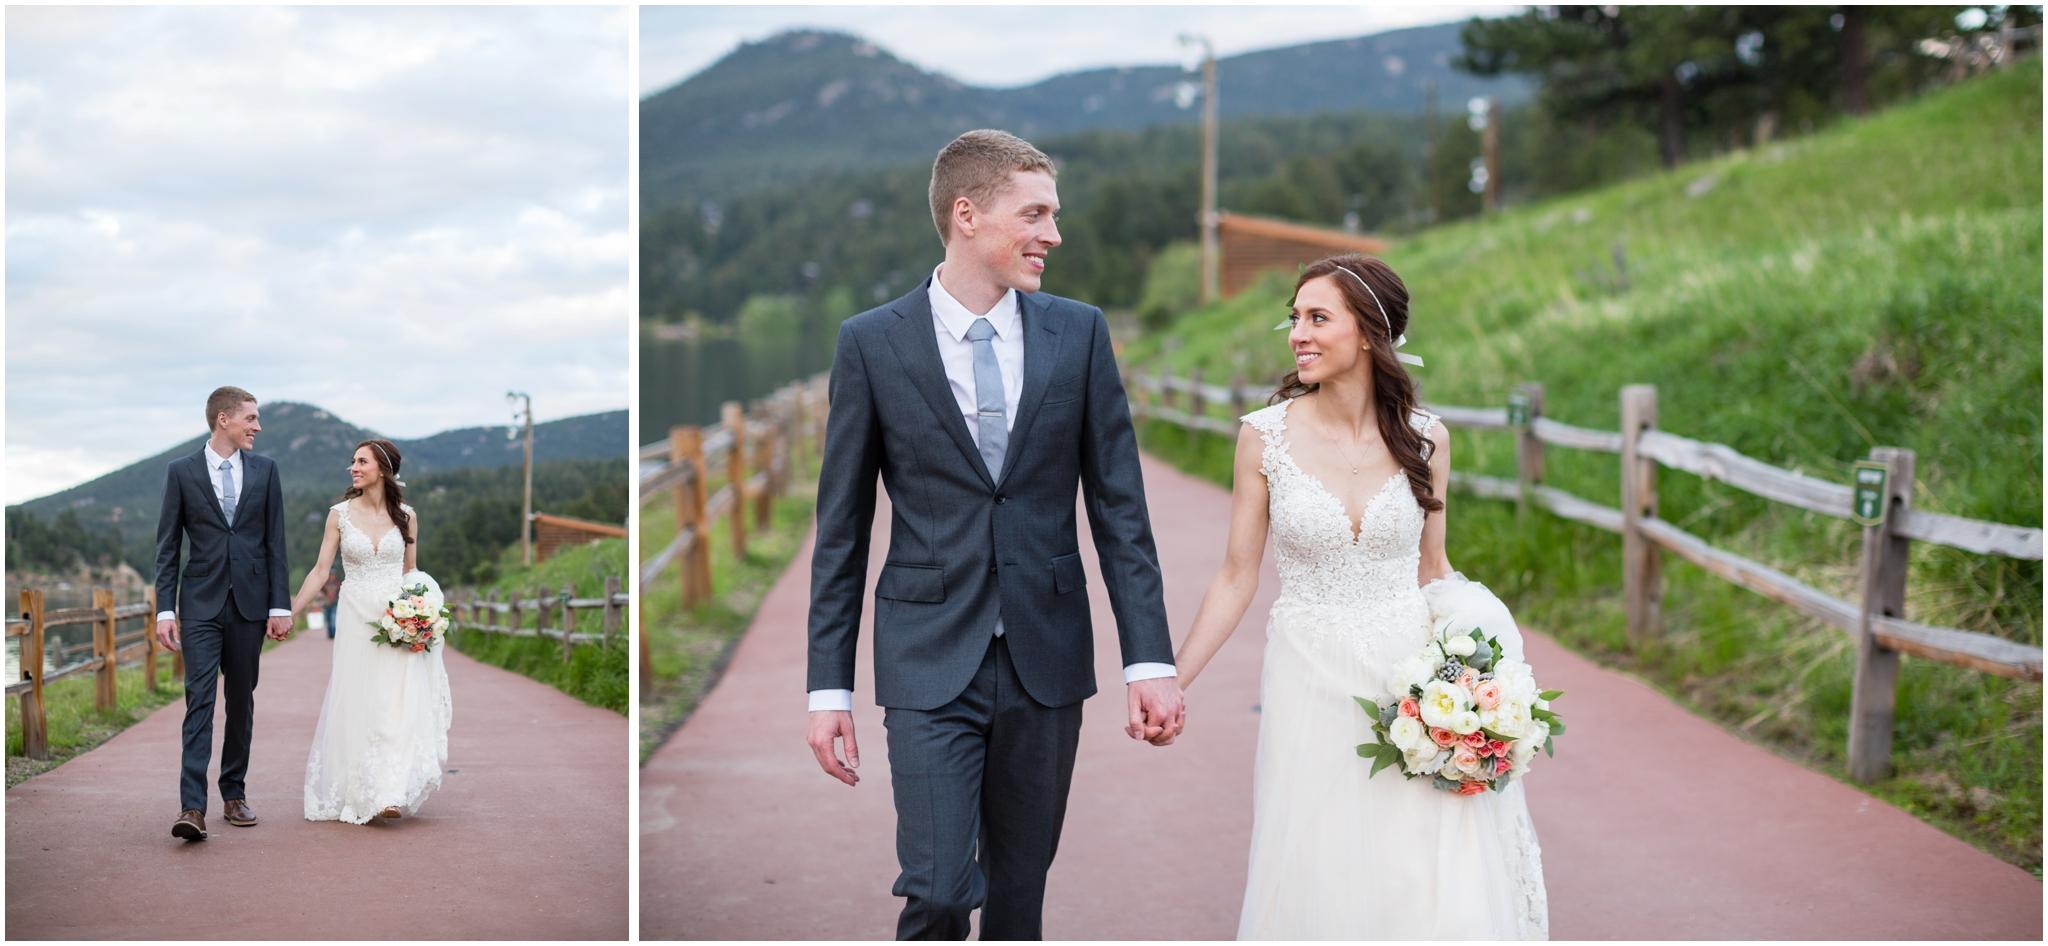 Bride_and_Groom_Walking_Evergreen_Lake_house_Wedding_Photographer.JPG